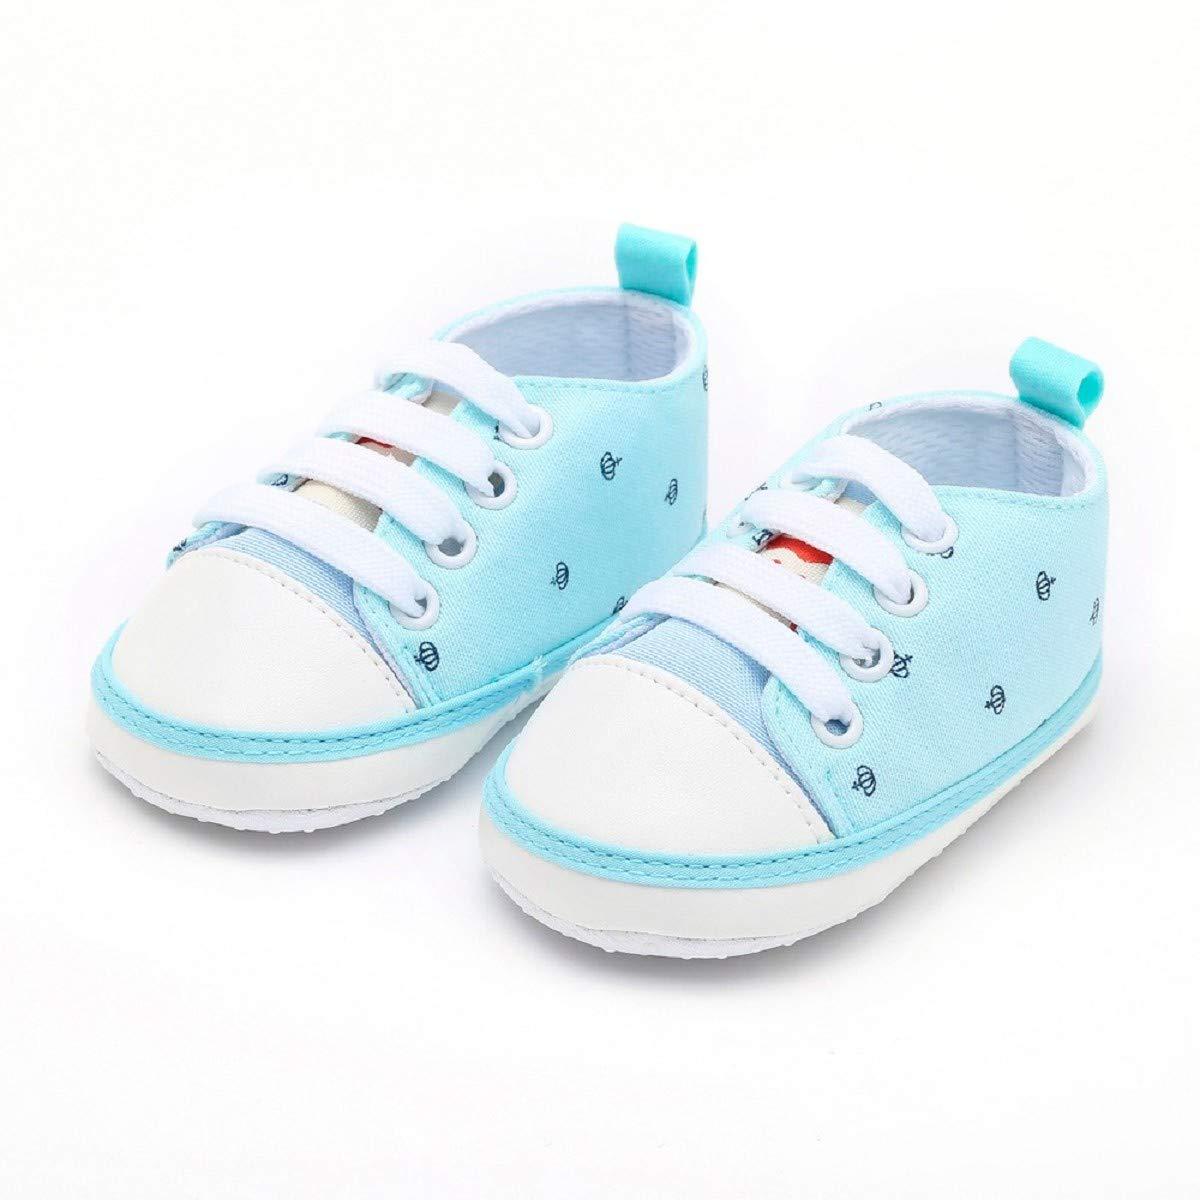 Newborn Shoes FAPIZI Toddler Baby Girls Boys Print Cute Soft Sole Casual Flats Bandage Canvas Shoes Blue